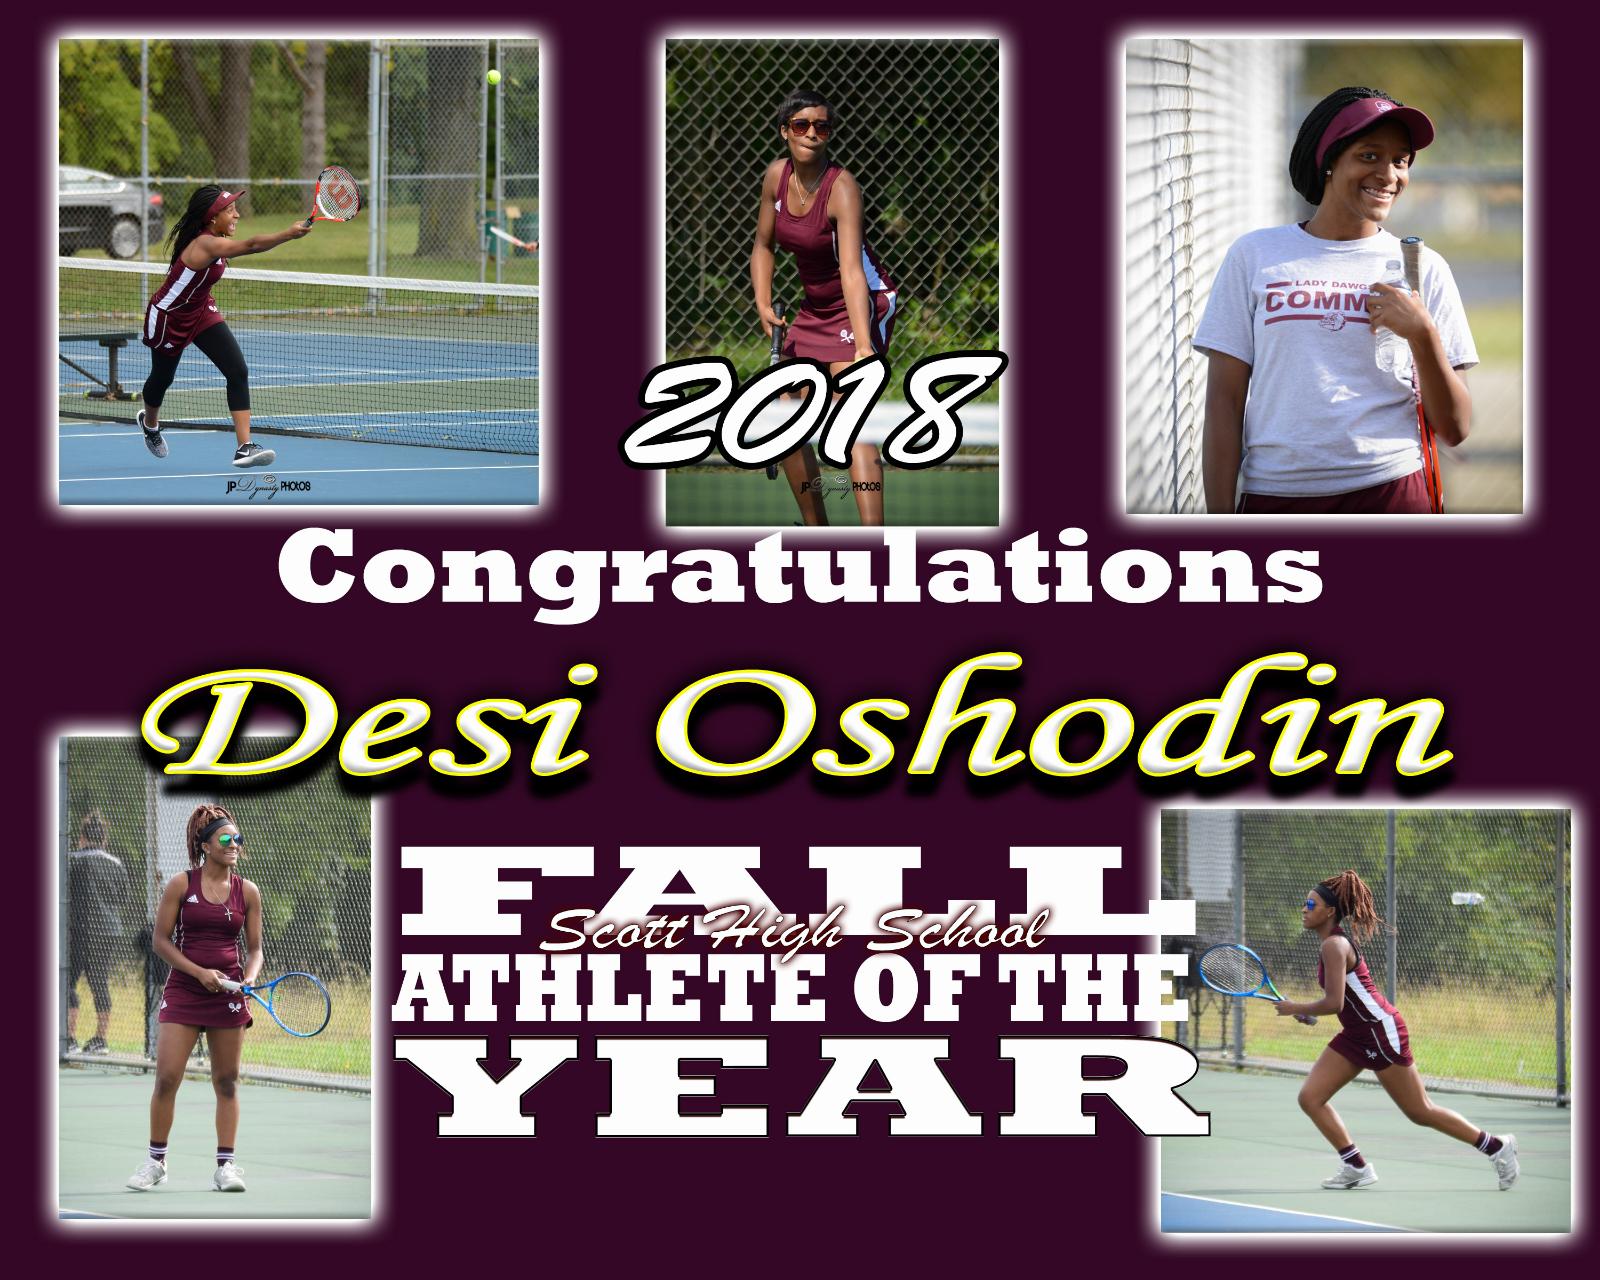 Desi Oshodin – Fall Athlete of the Year 2018